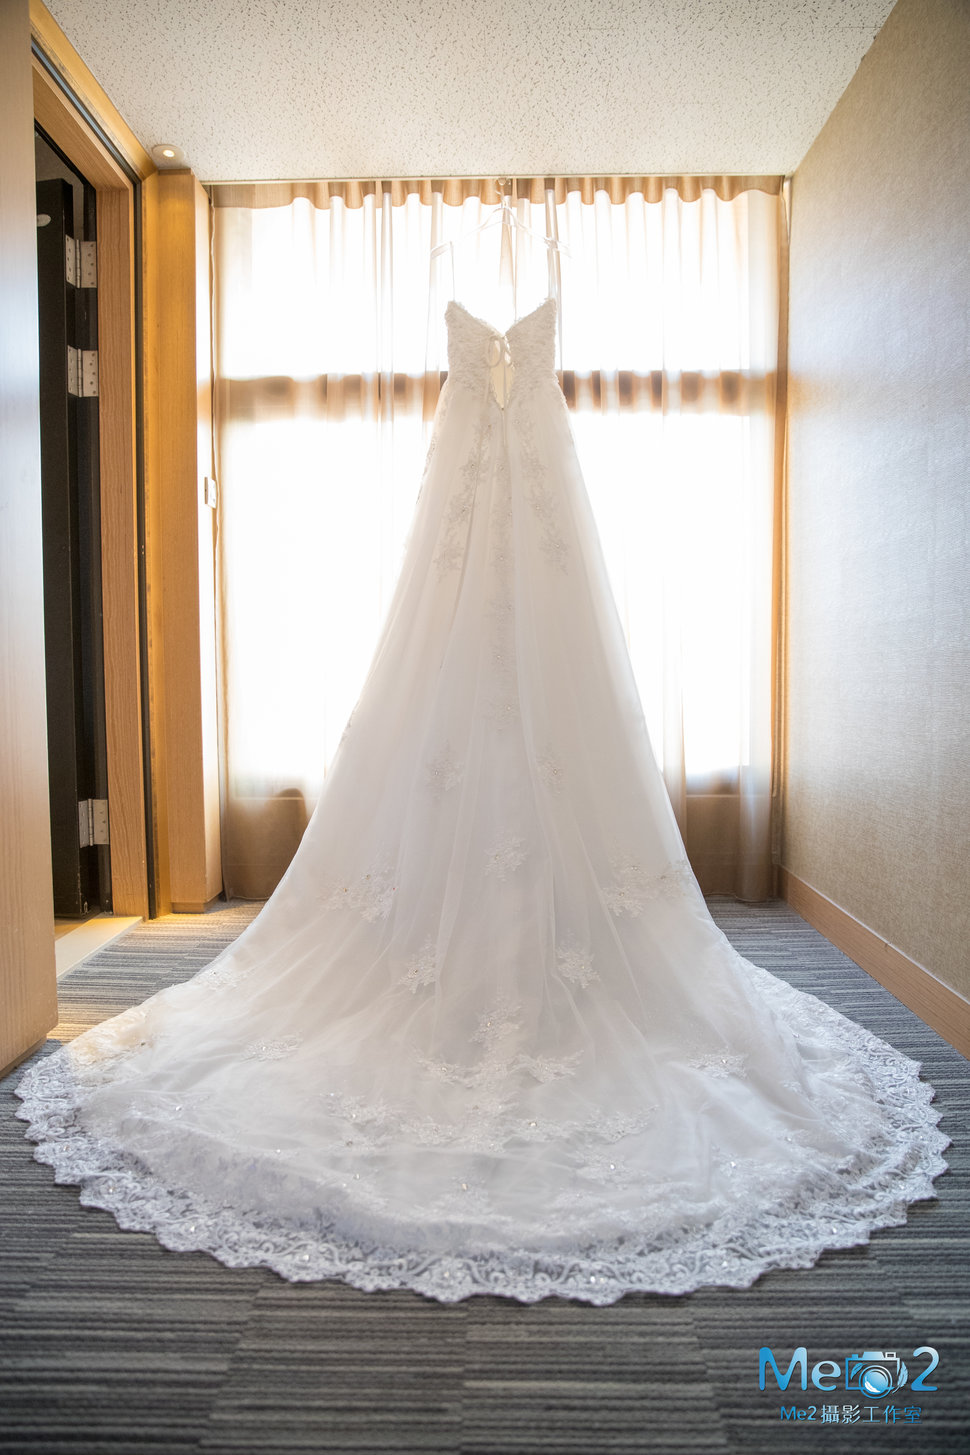 1DX20208 - Me2Jason攝影工作室《結婚吧》